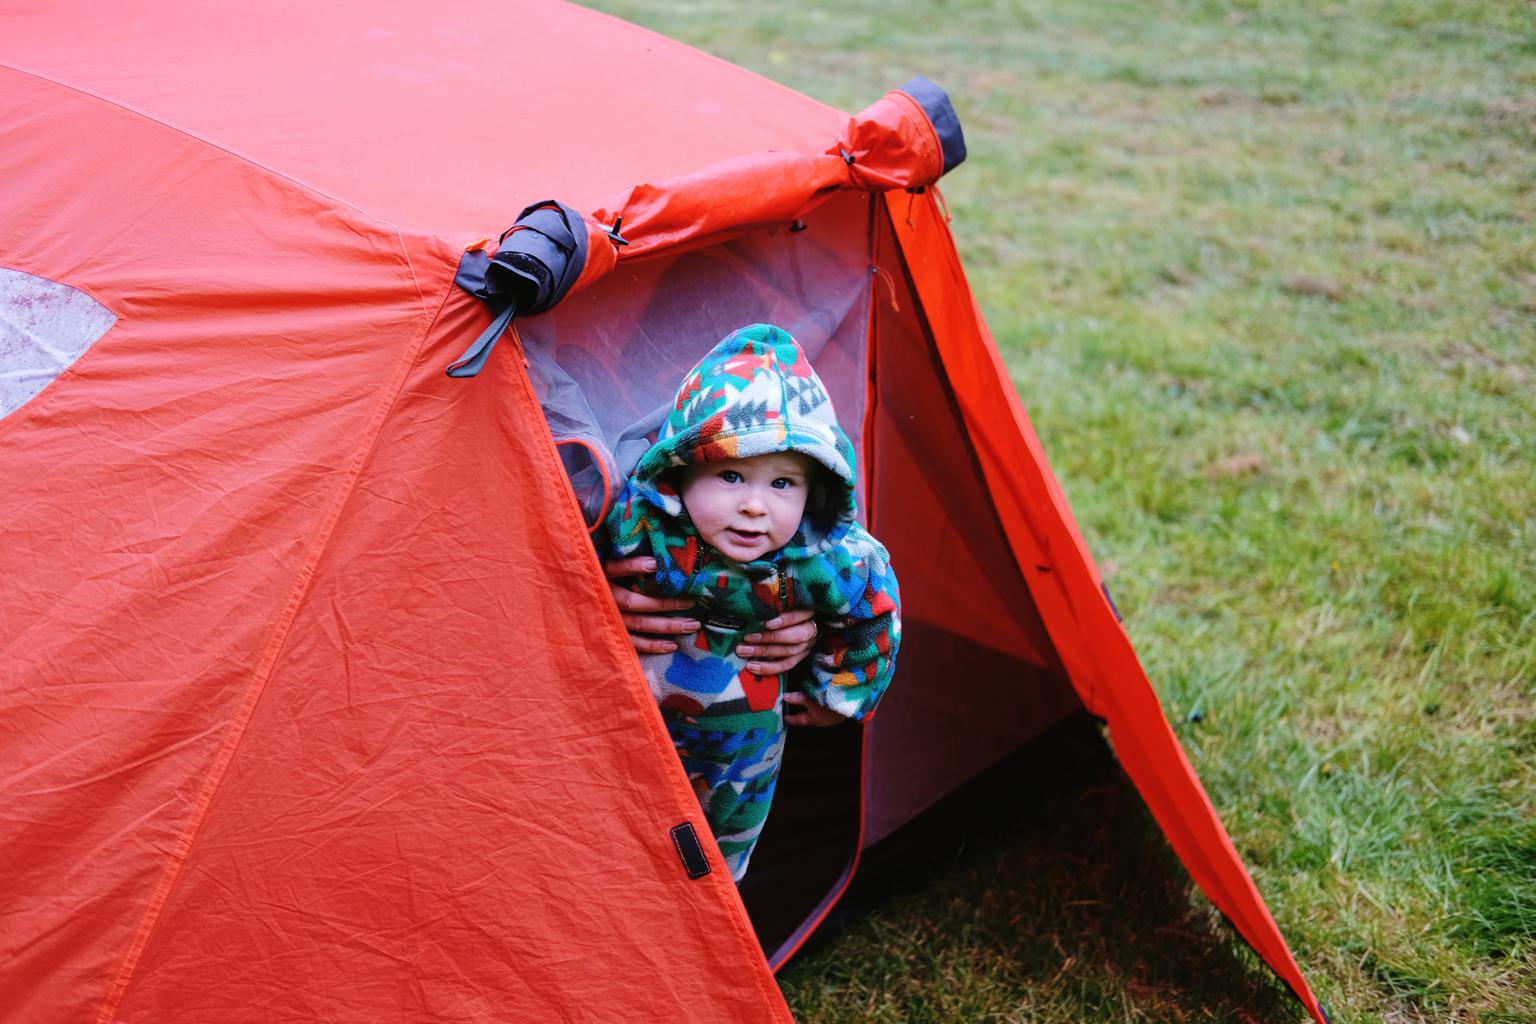 Baby Benji bundled up in Patagonia, toasty and warm